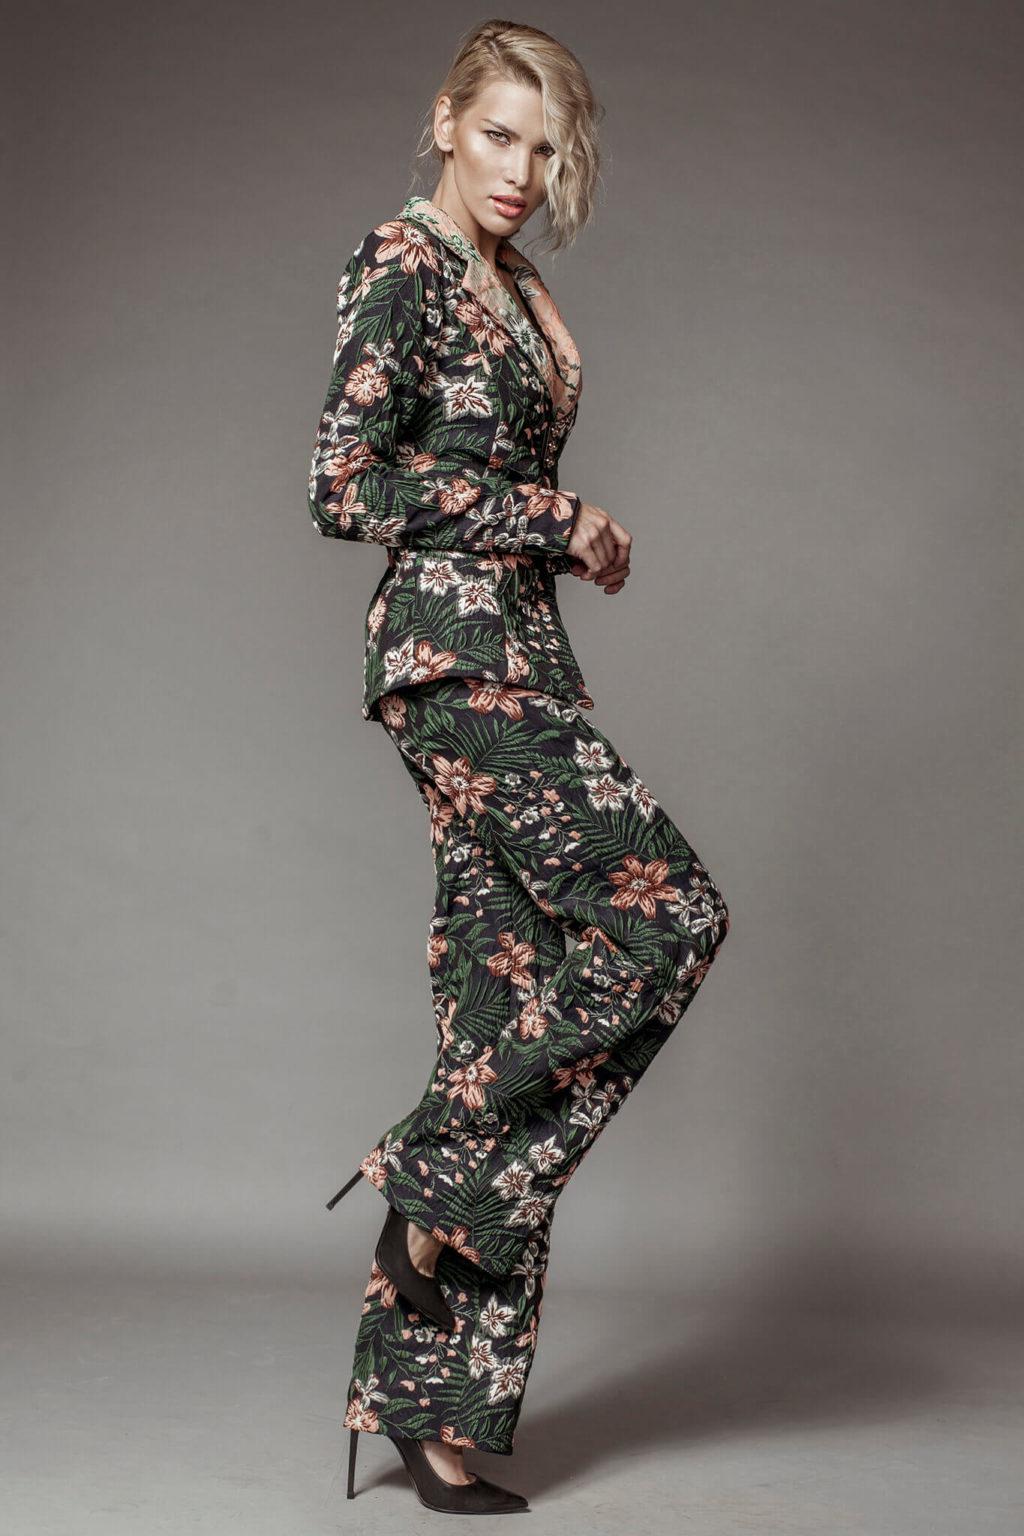 Costum din brocart cu imprimeu floral brand romanesc